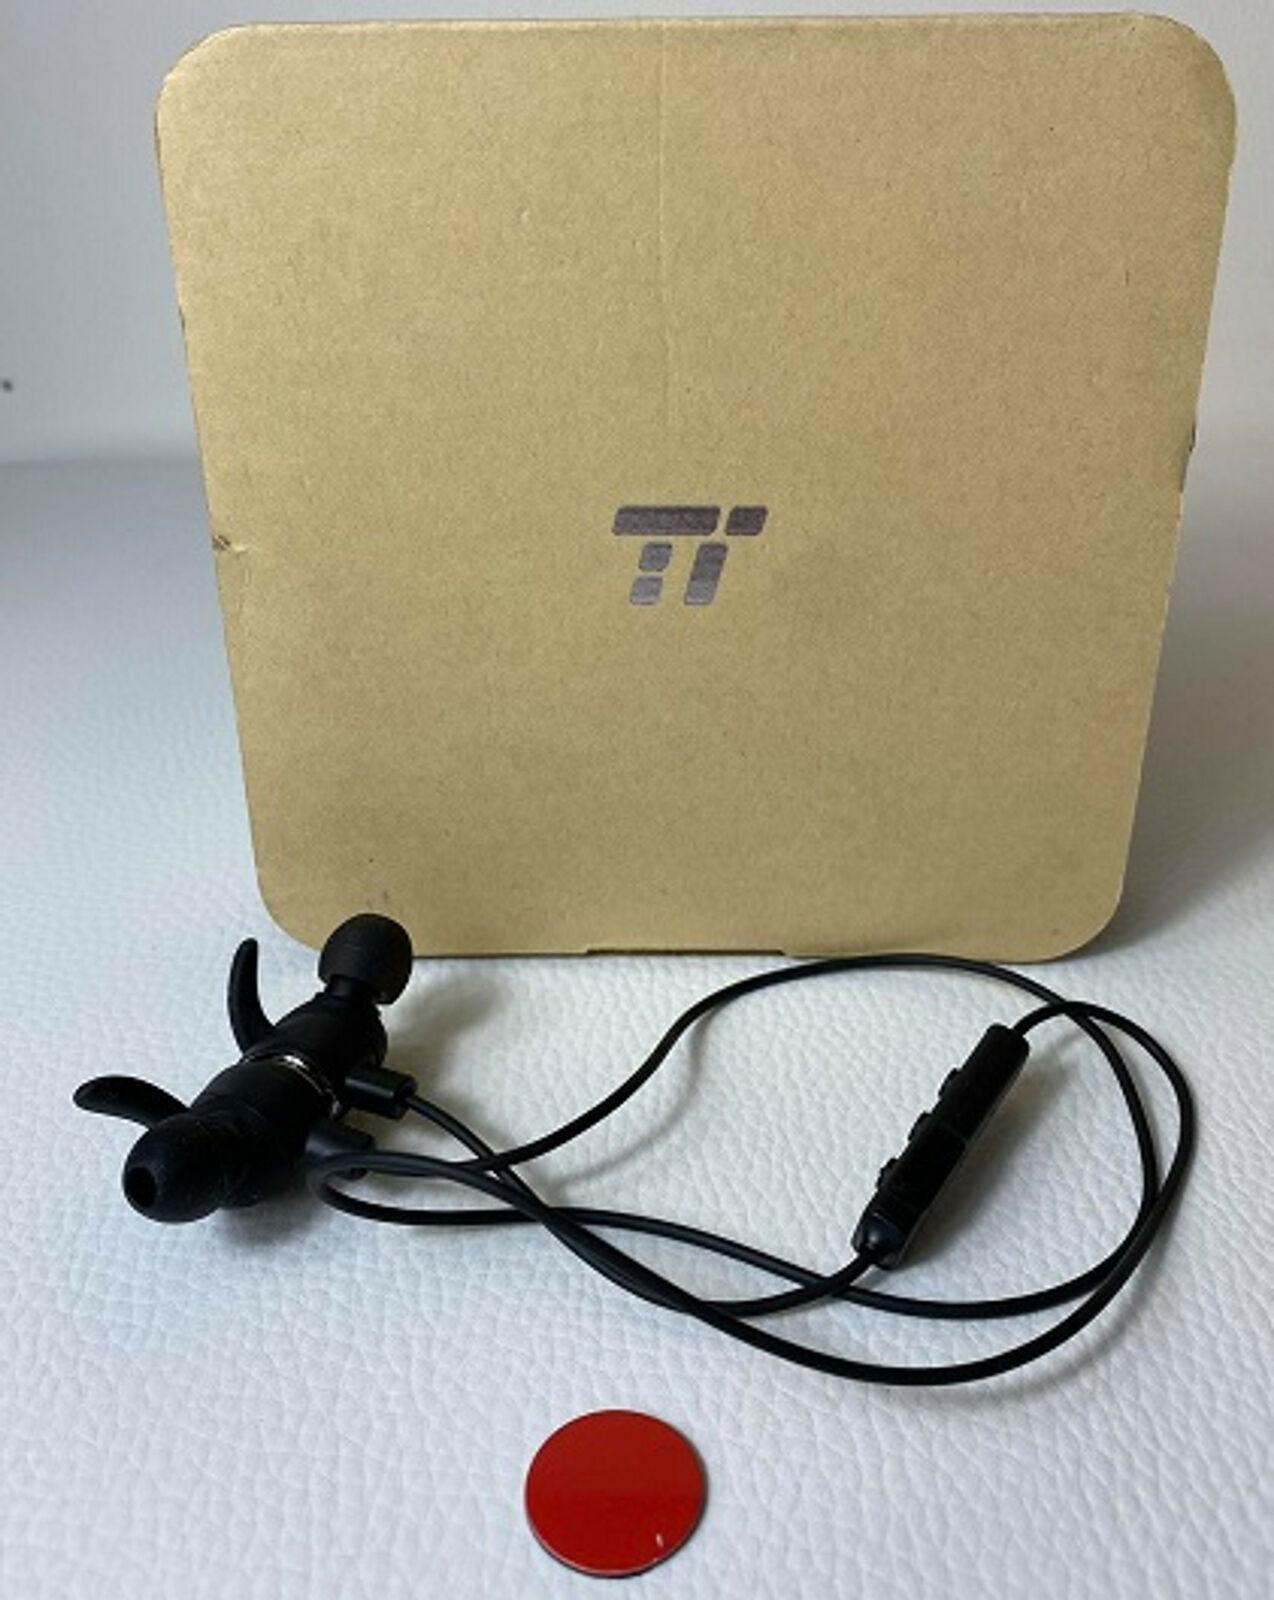 TaoTronics Bluetooth Kopfhörer Headset gebraucht in OVP Neuwertig